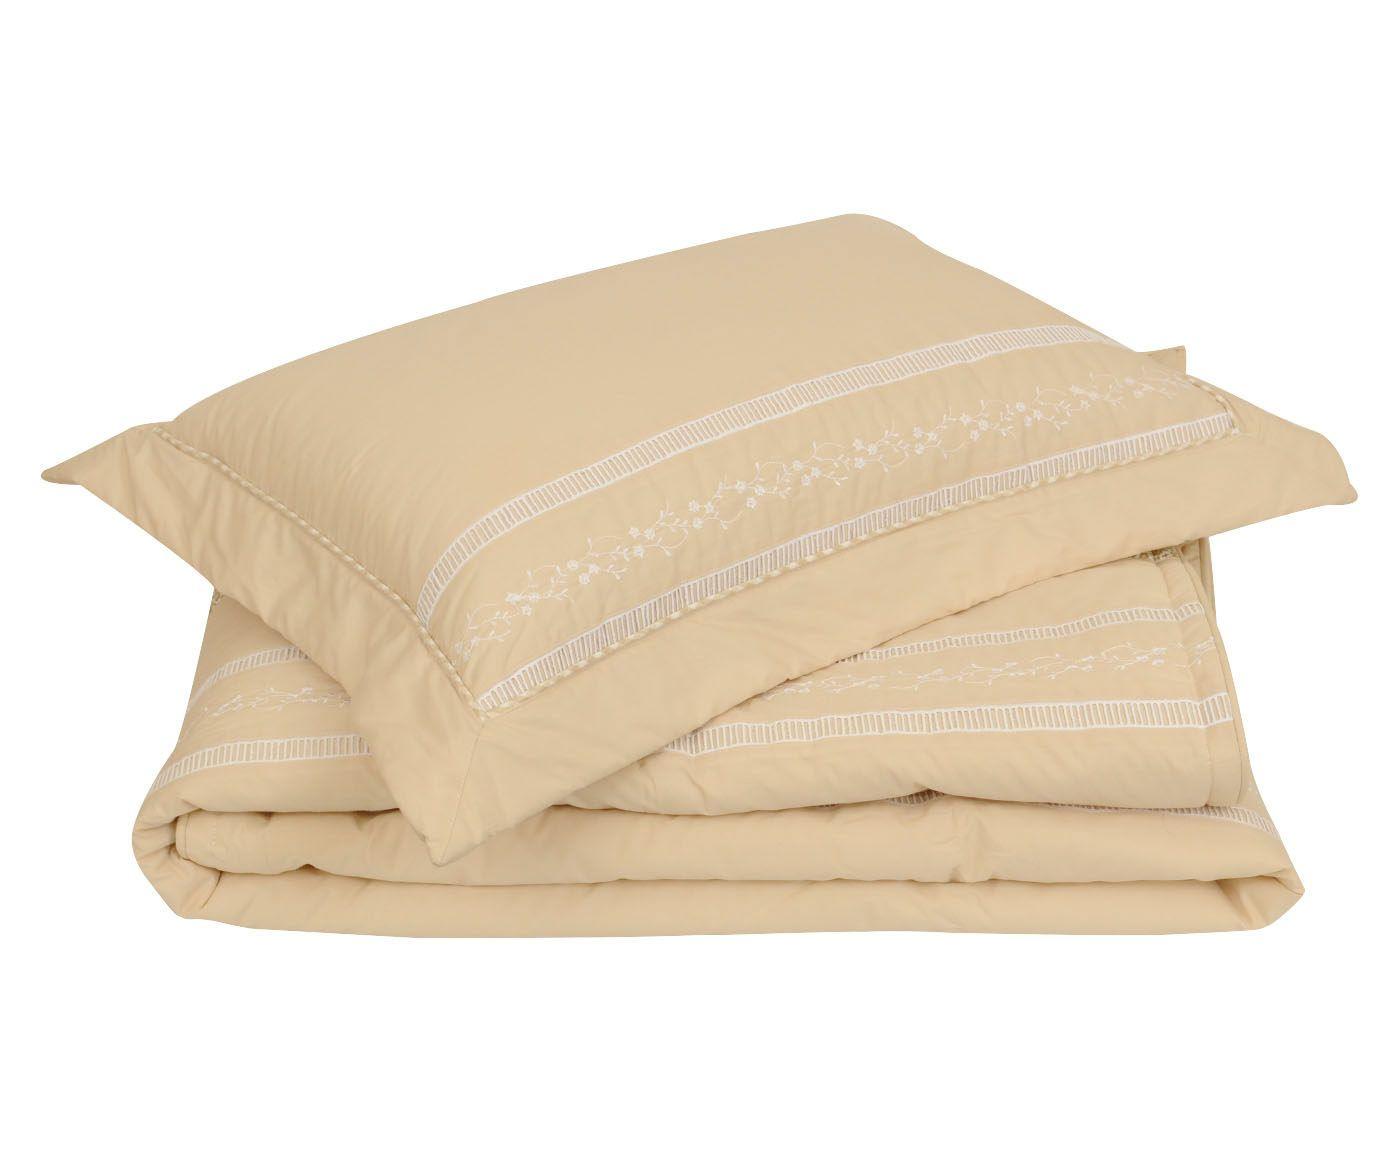 Conjunto de colcha daya para cama super king size 200 fios   Westwing.com.br